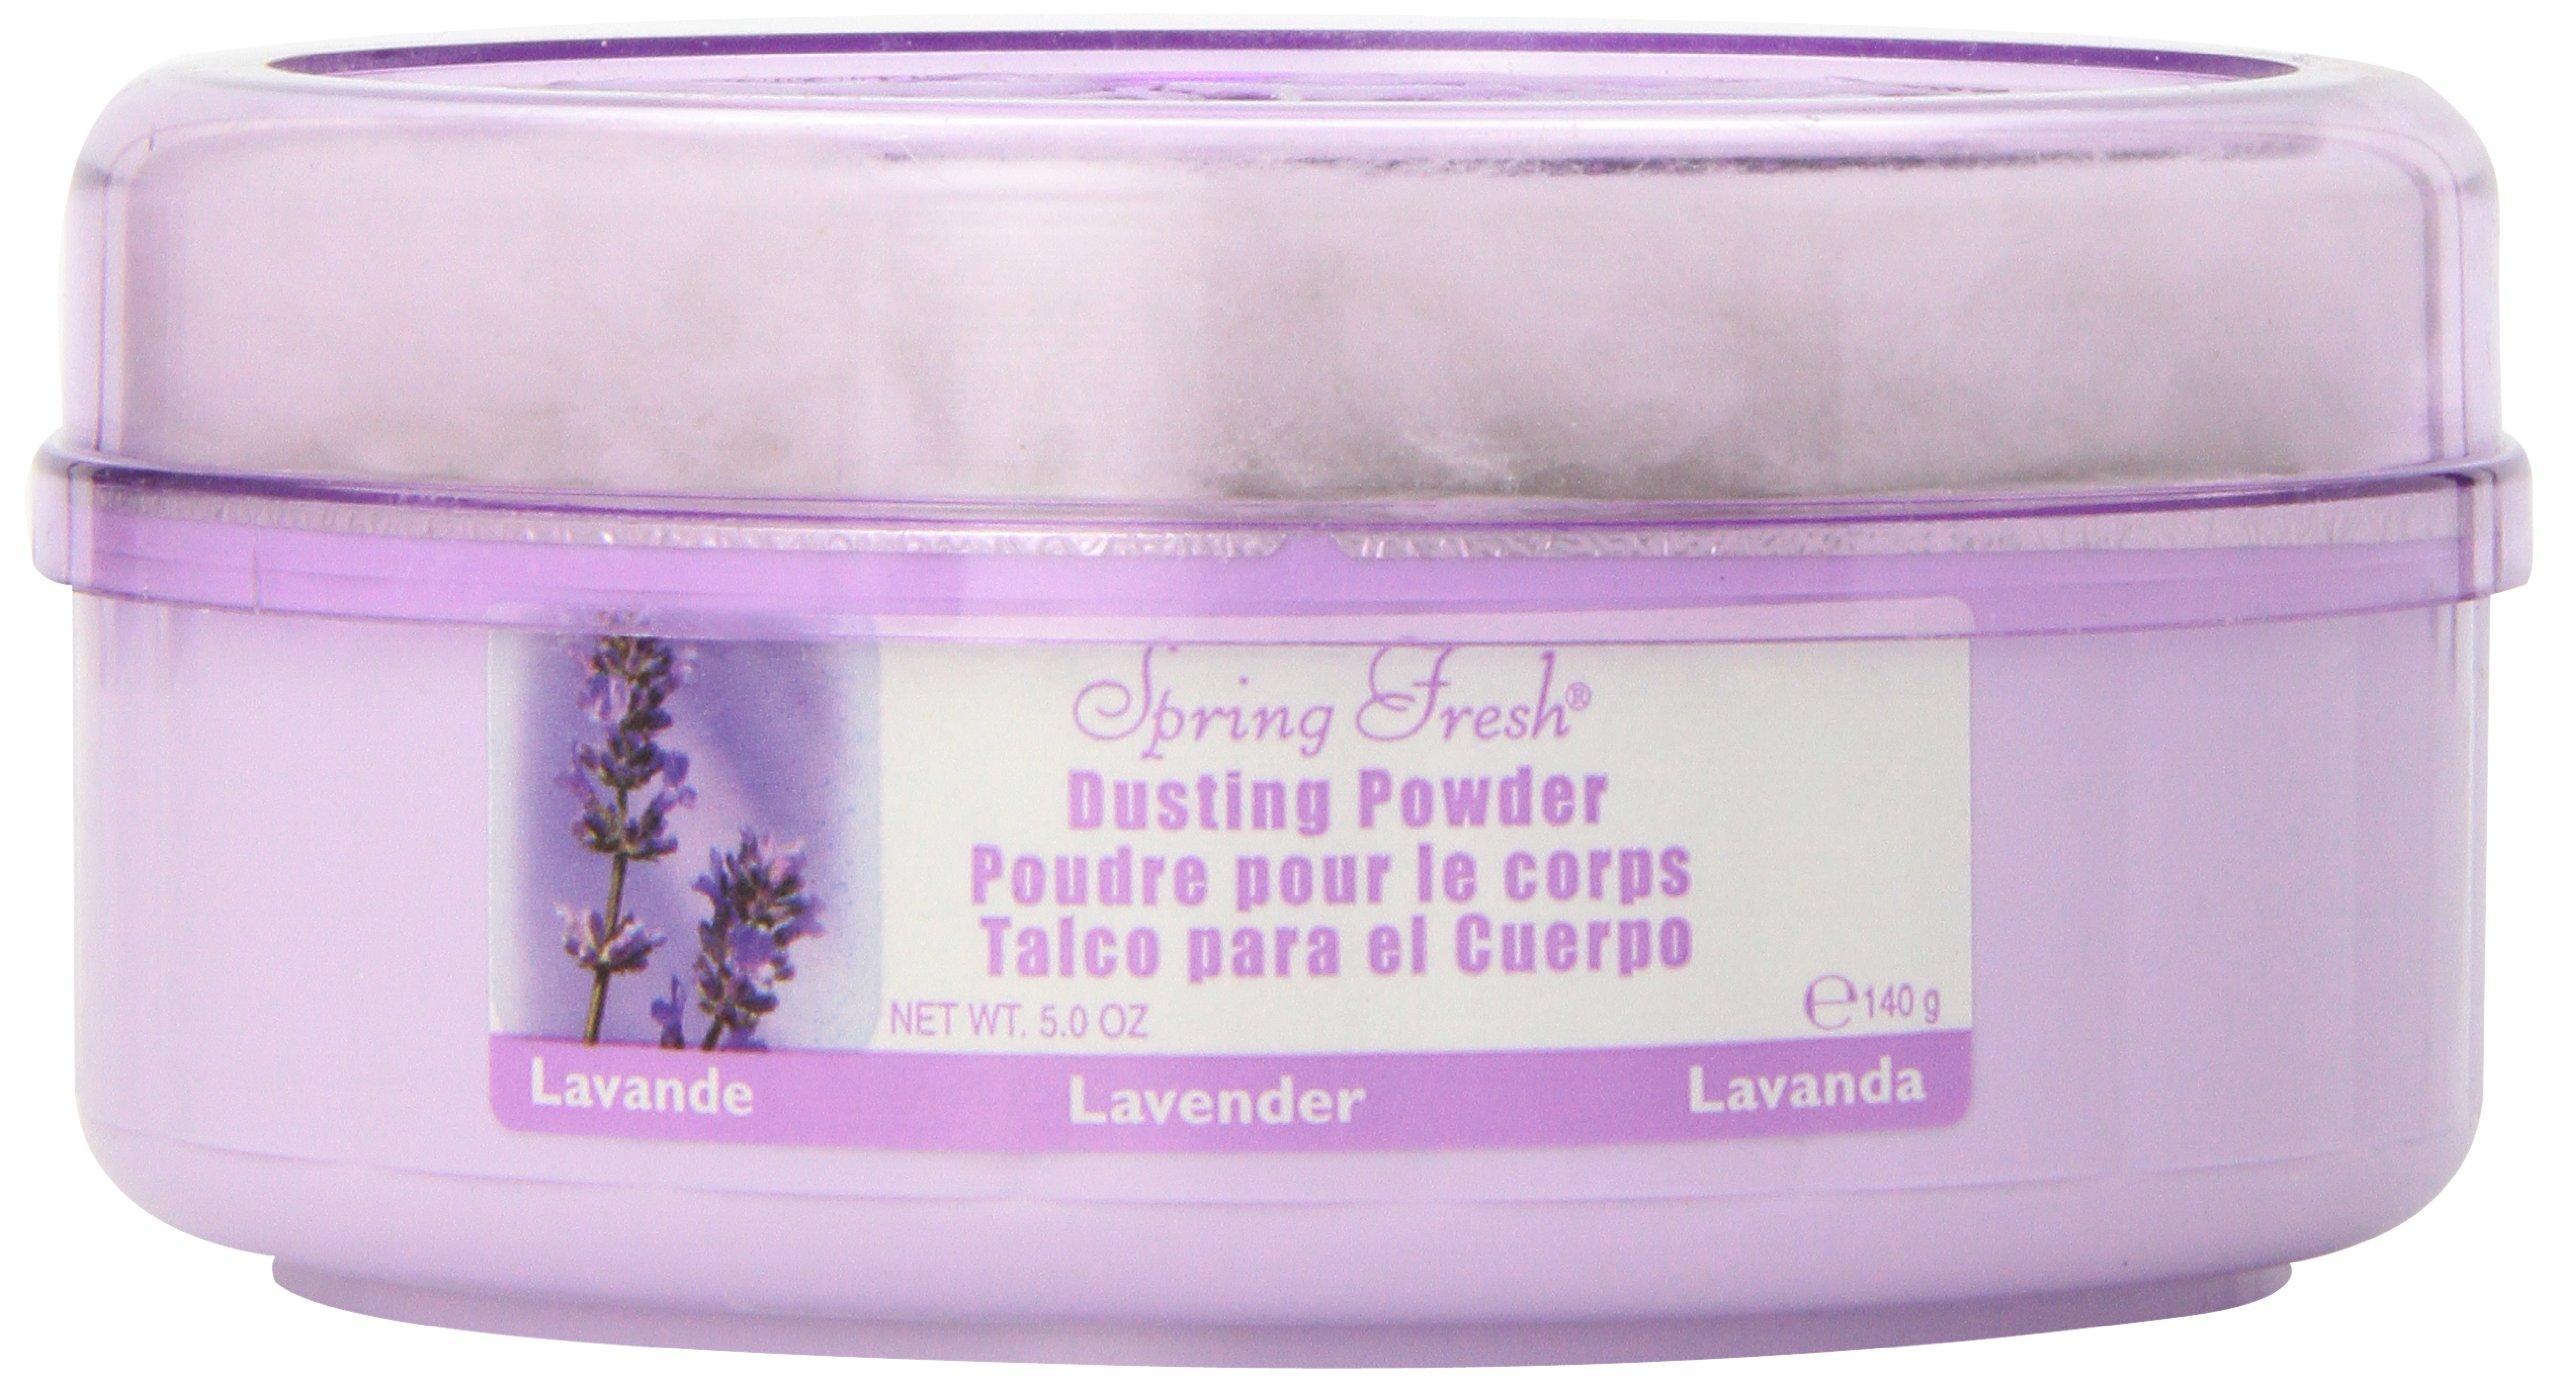 Belcam Bath Therapy Dusting Powder, Lavender, 5 Ounce